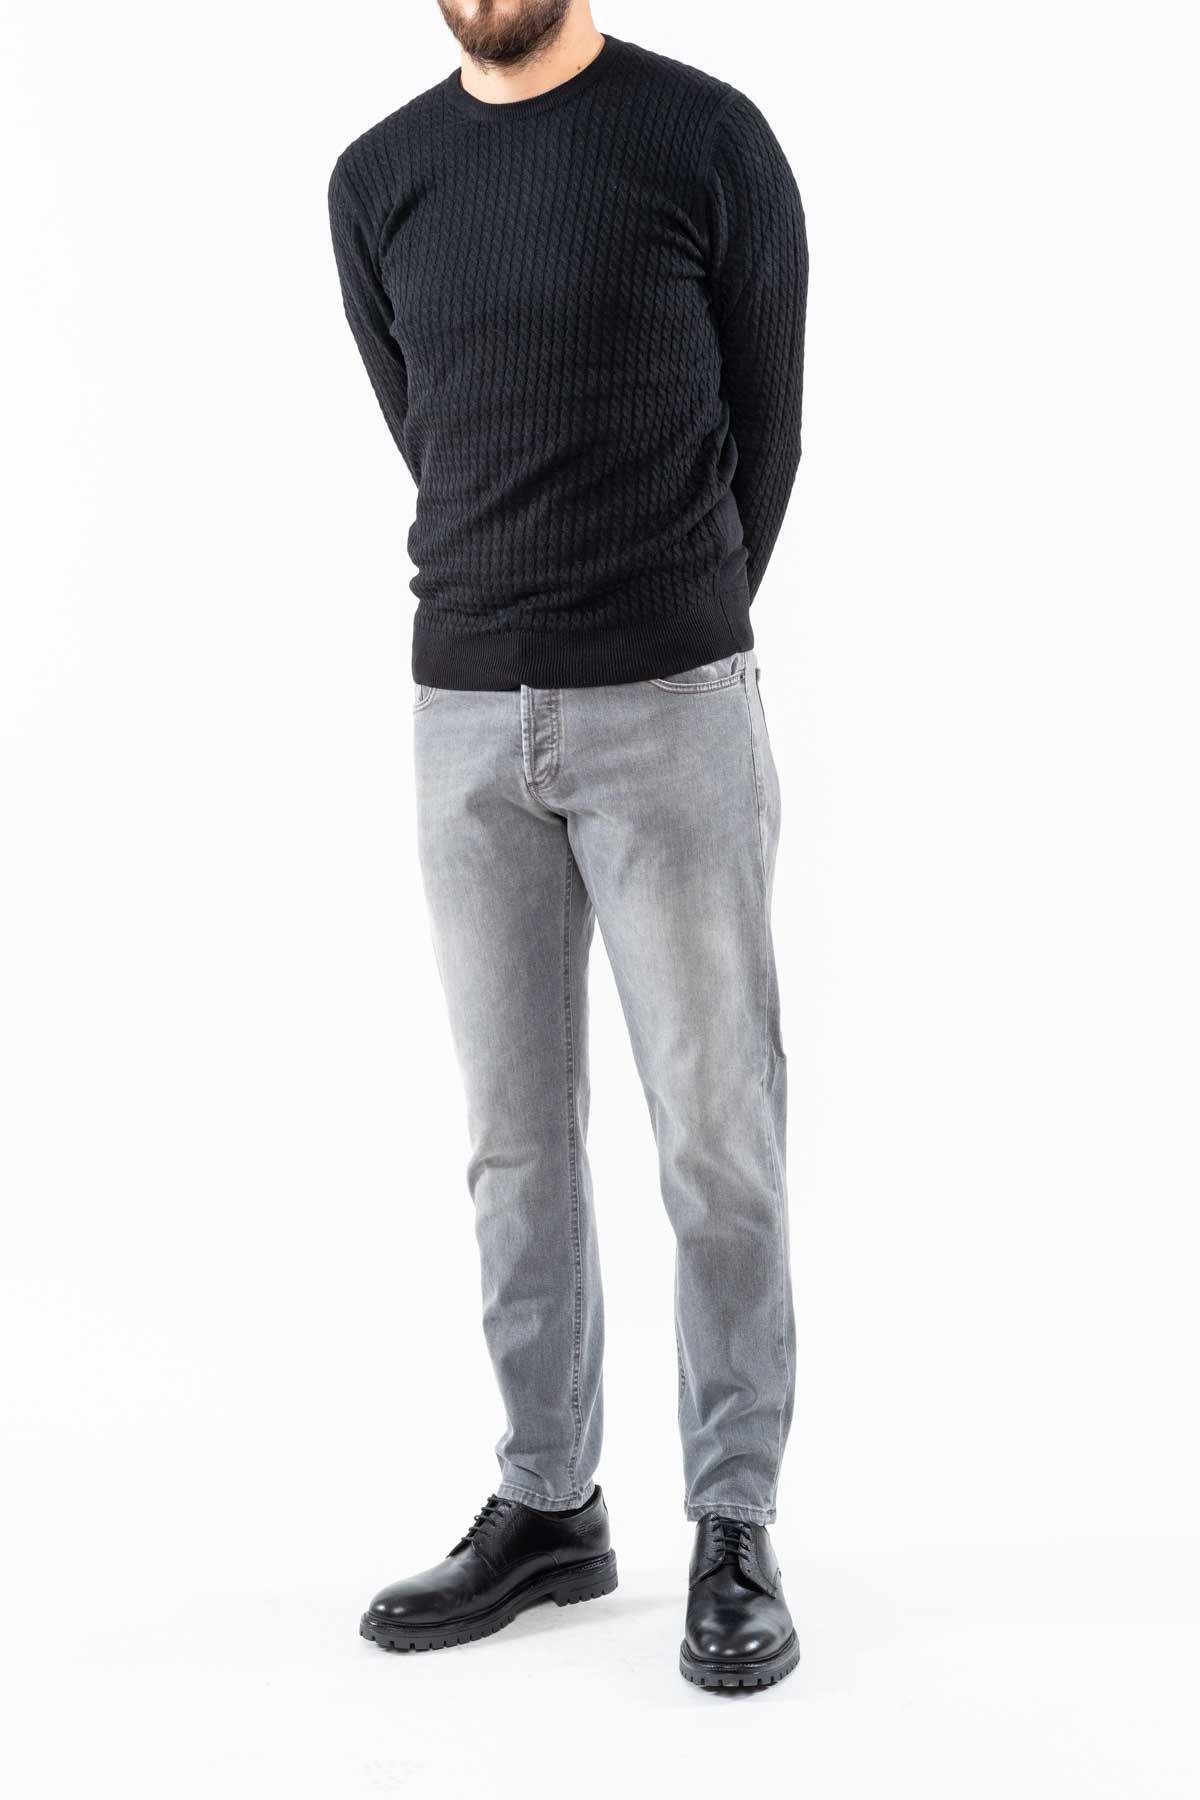 jeans,grigio